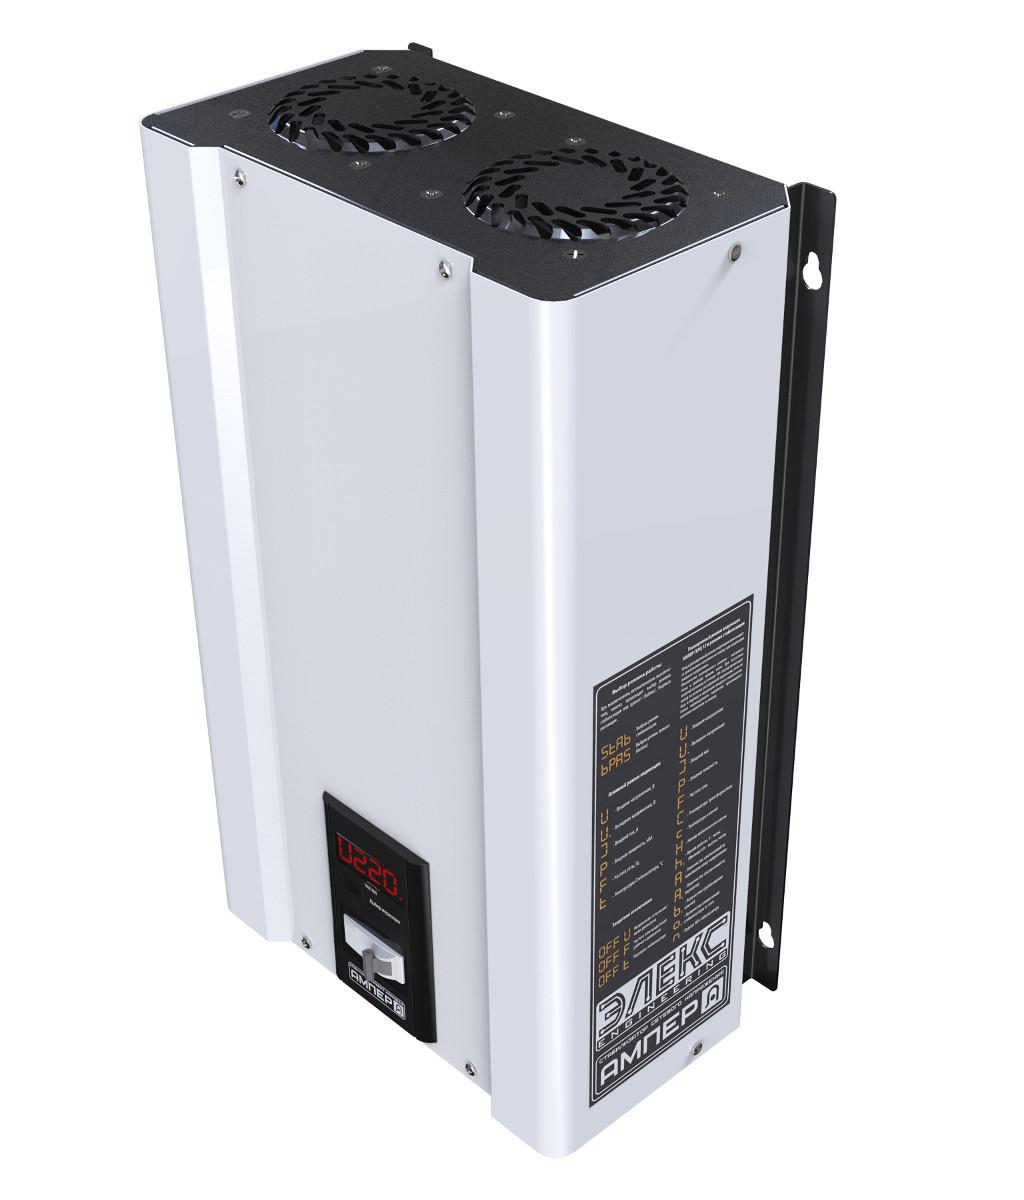 Стабилизатор напряжения Элекс Ампер 16-1/50A-Т 11кВт V2.0